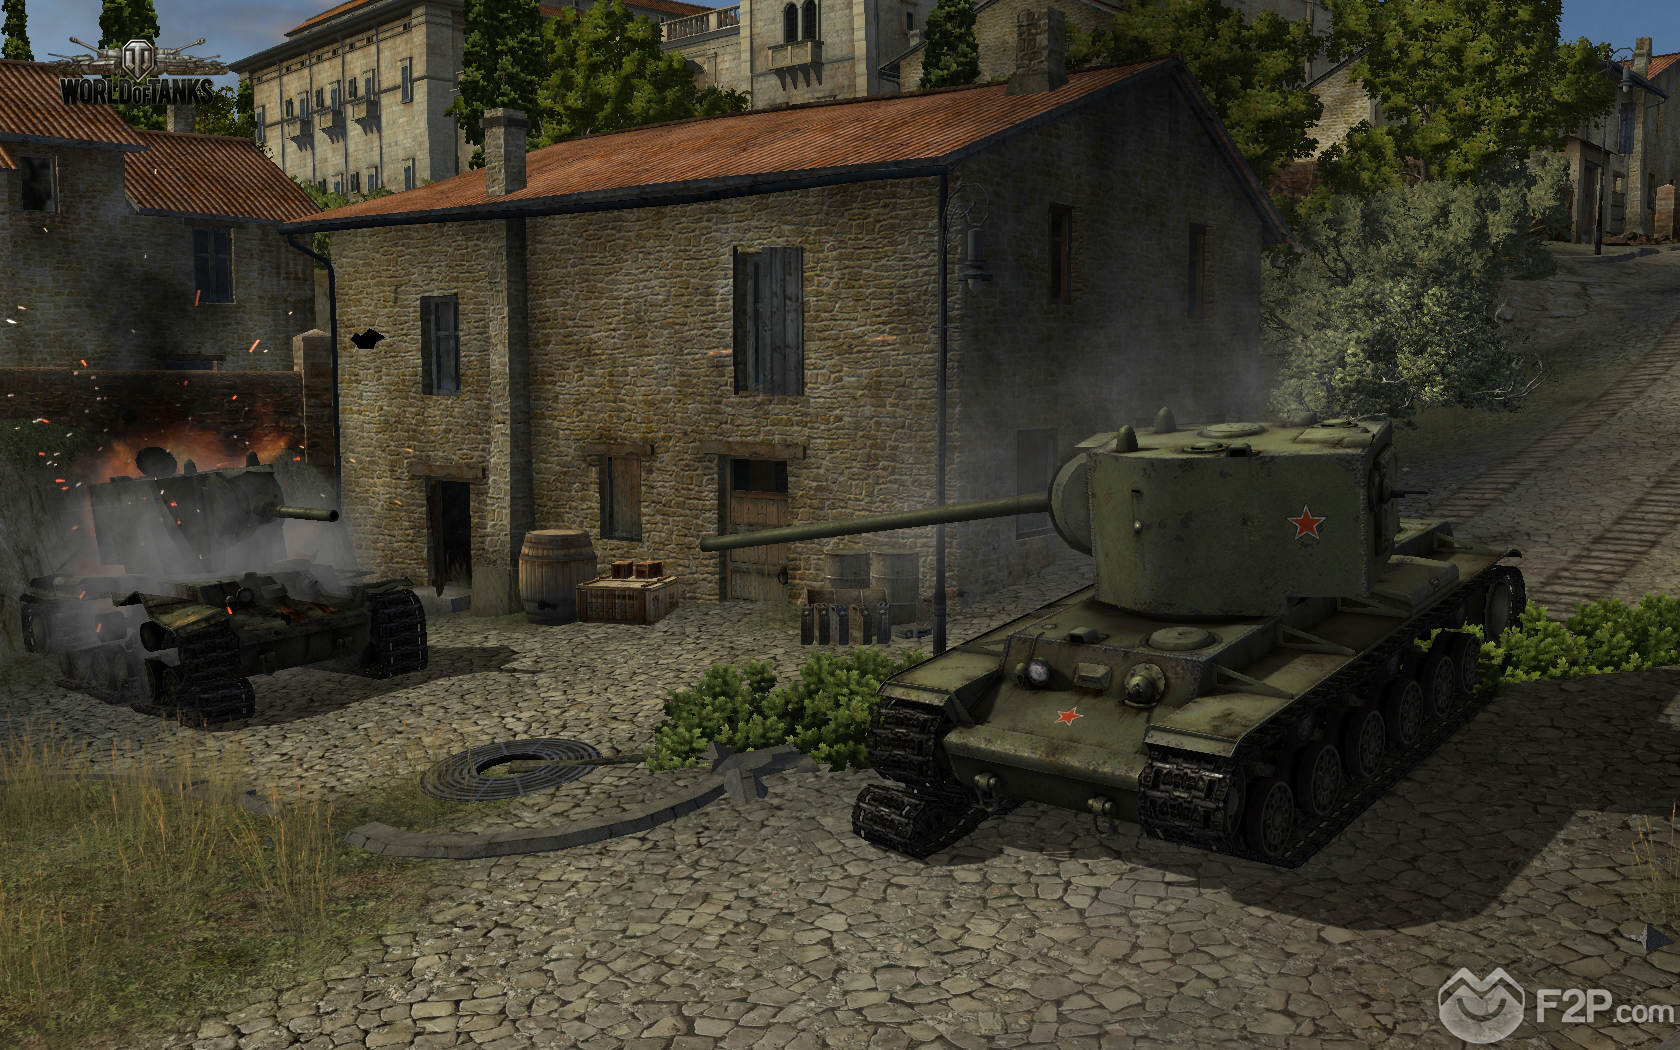 Click image for larger version.Name:World of Tanks 56.jpgViews:115Size:1.59 MBID:3851